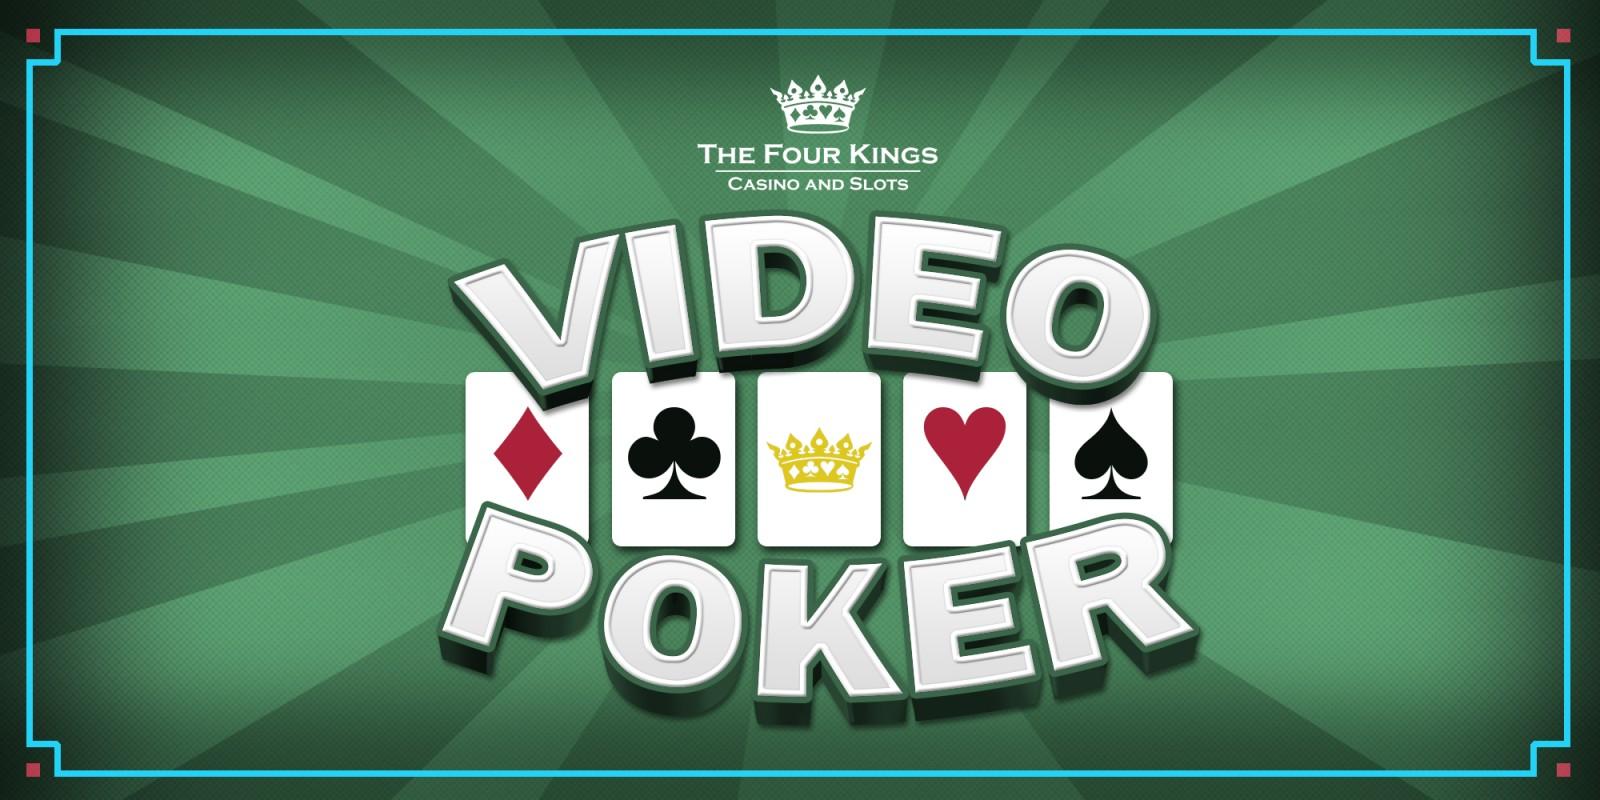 Four Kings: Video-Poker